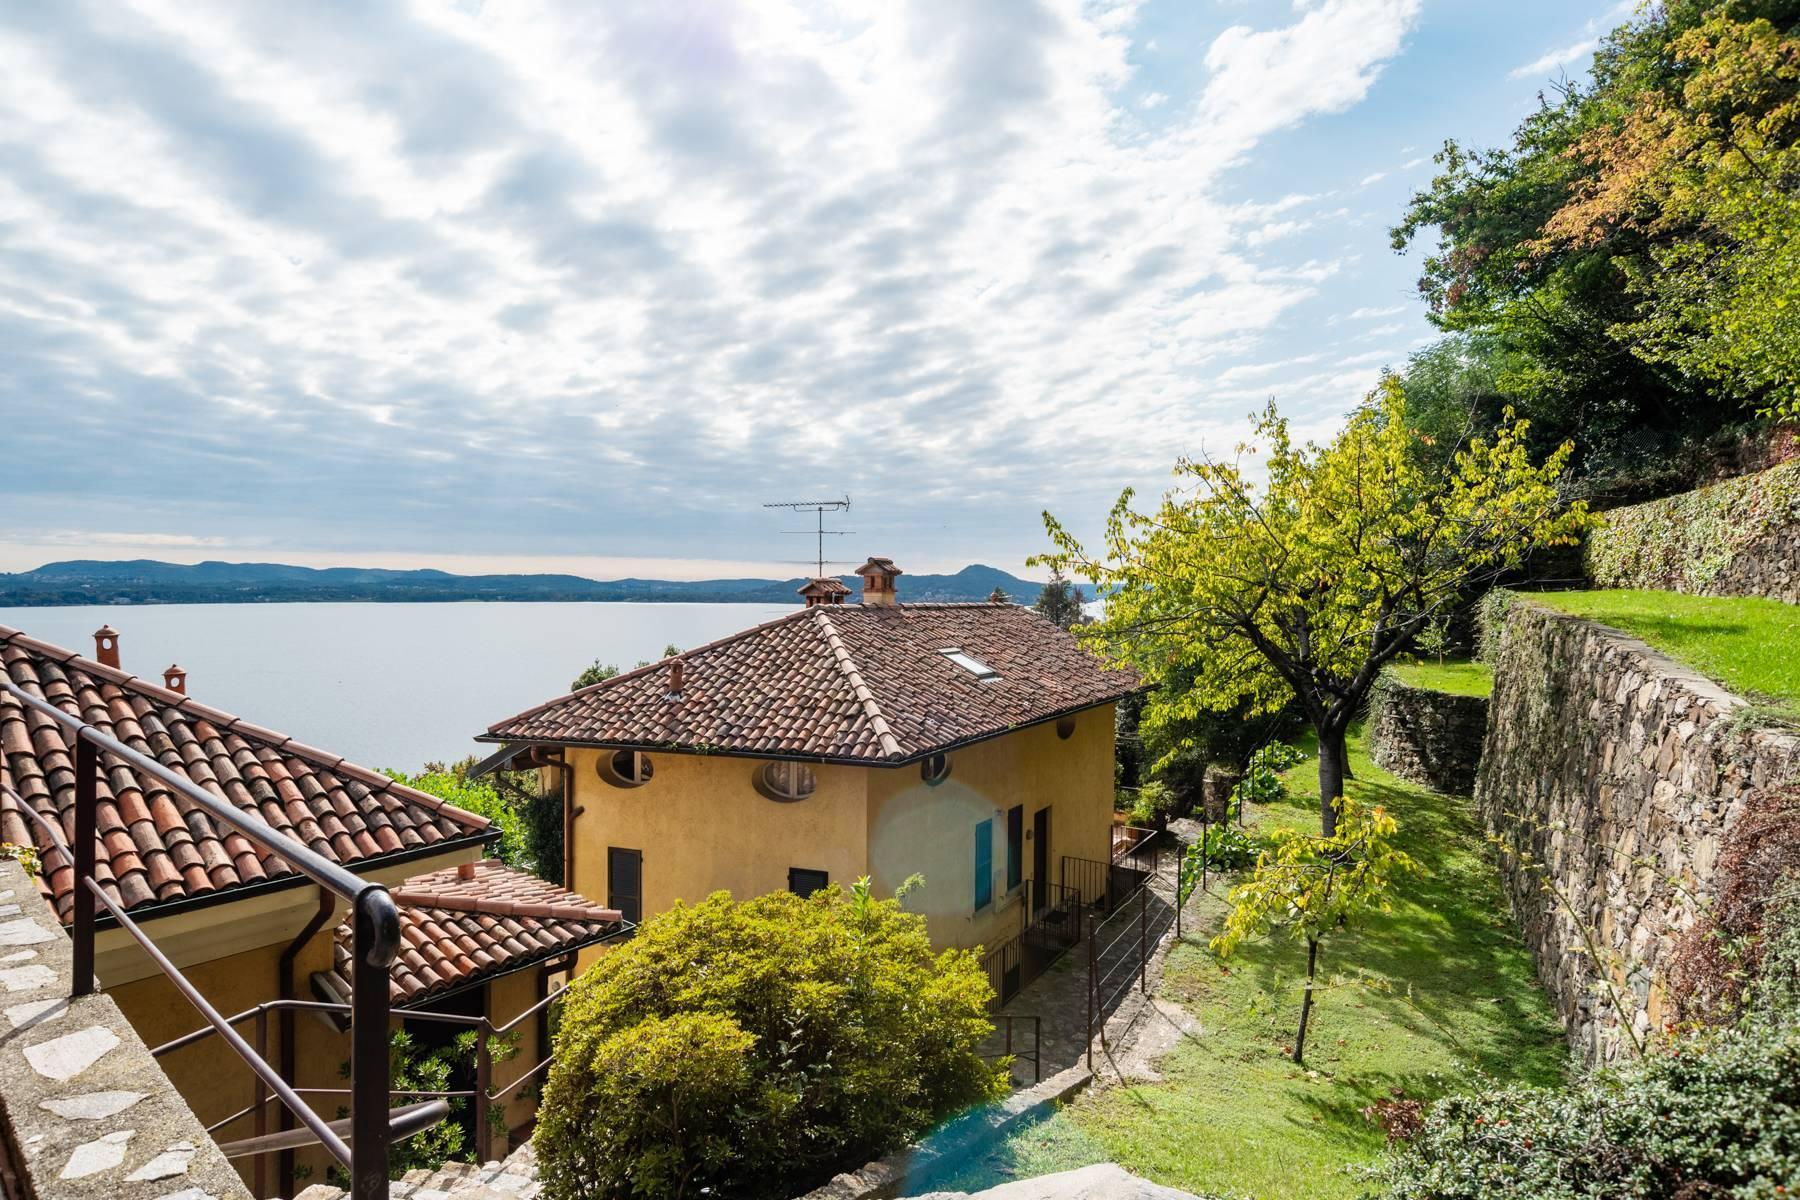 Elegant apartment in the small hamlet of Belgirate - 25